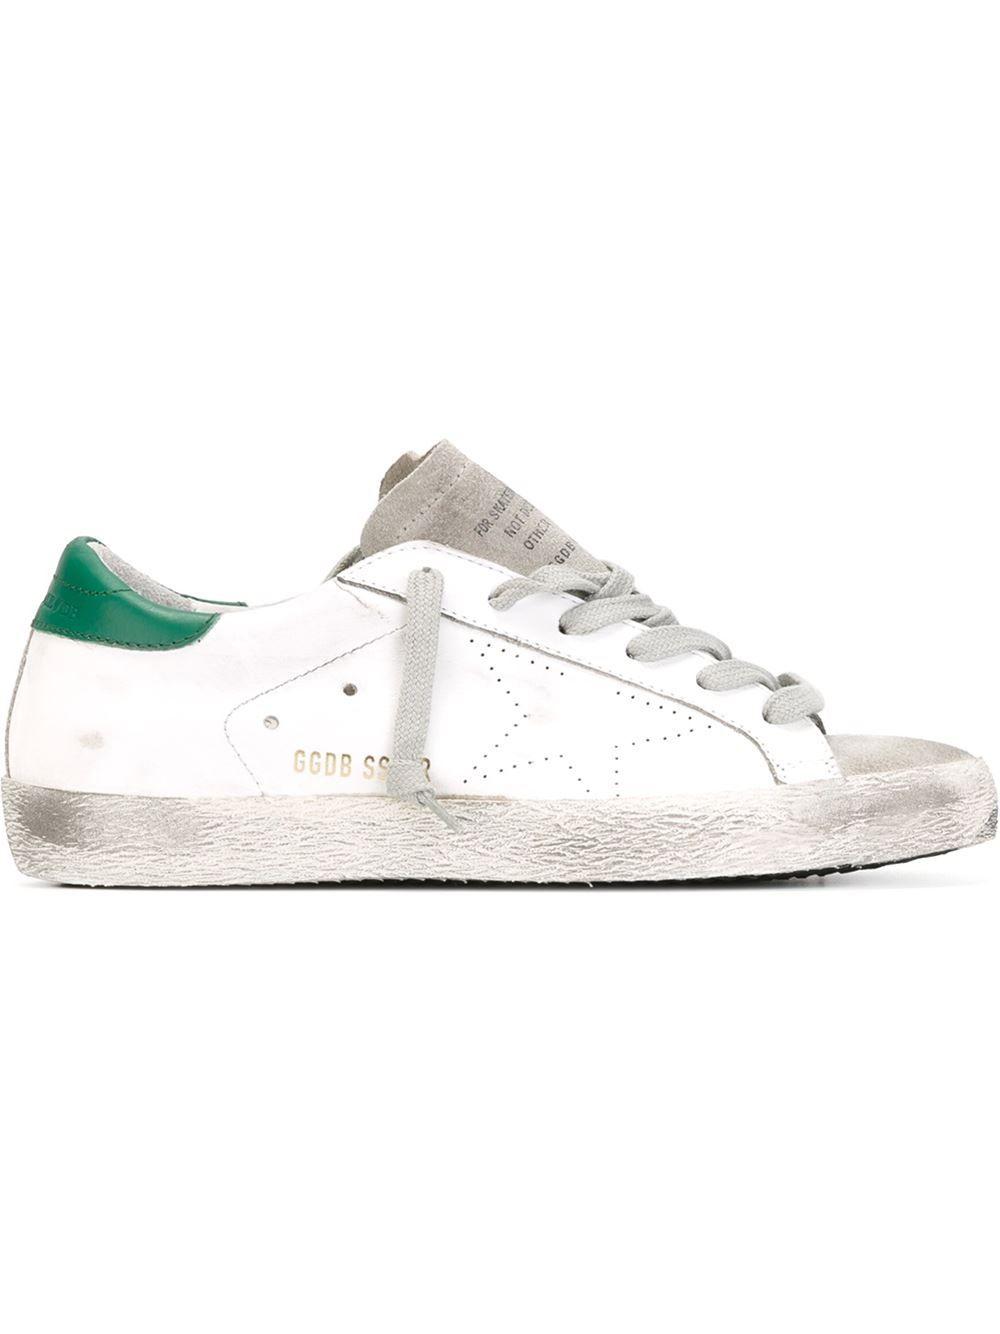 9f261379ea04 Golden Goose Deluxe Brand Zapatillas